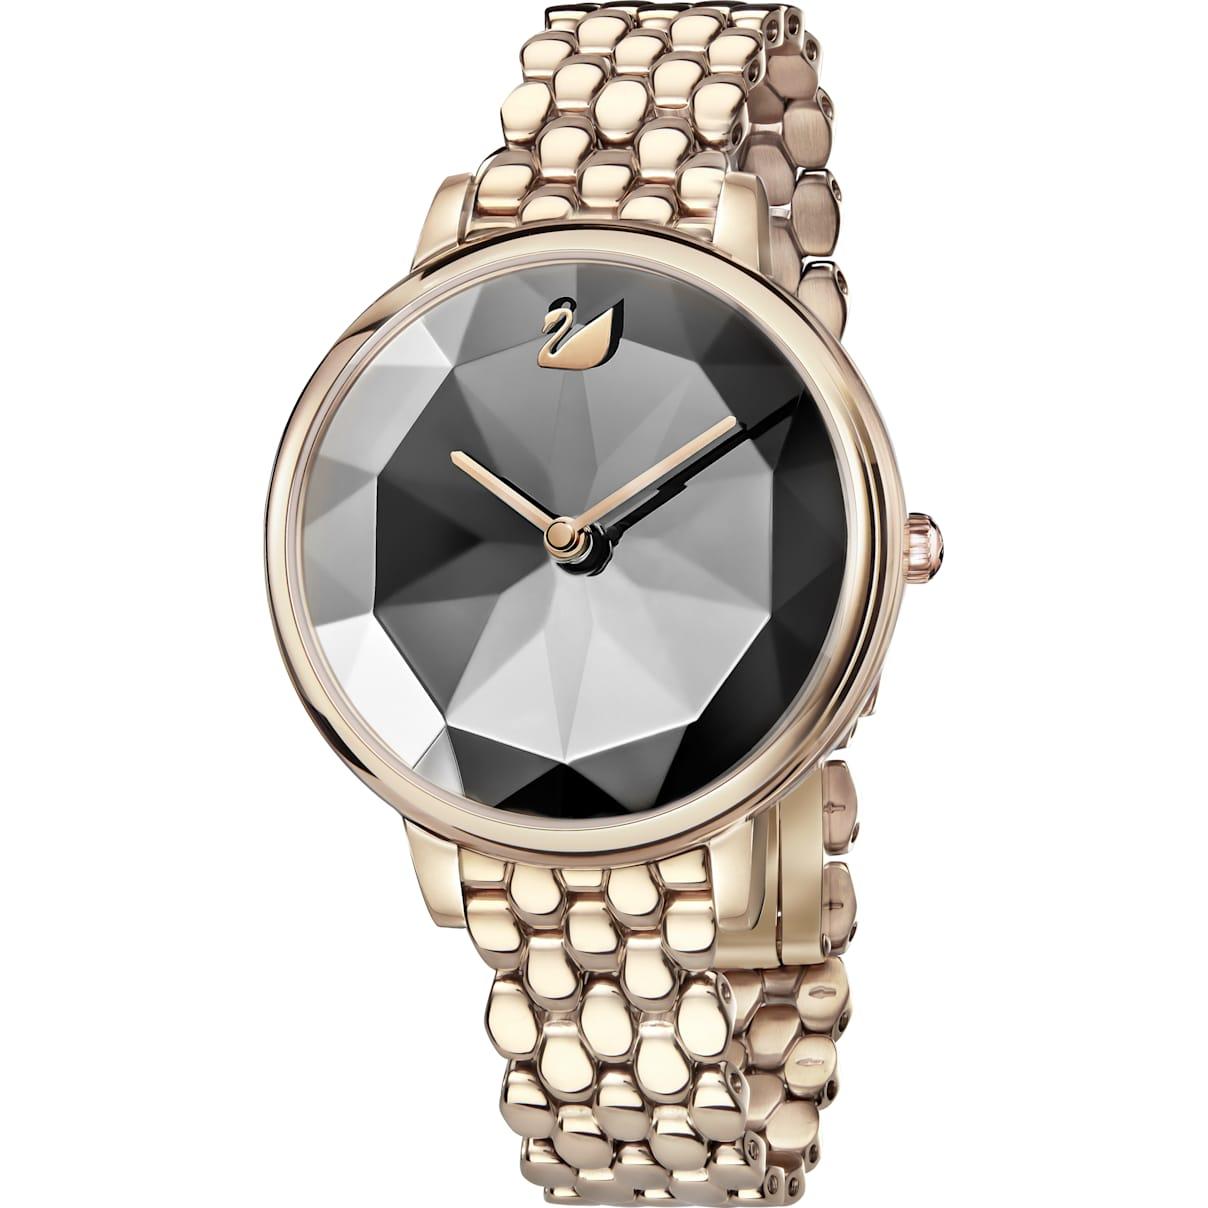 Swarovski Crystal Lake Watch, Metal bracelet, Dark Gray, Champagne-gold tone PVD